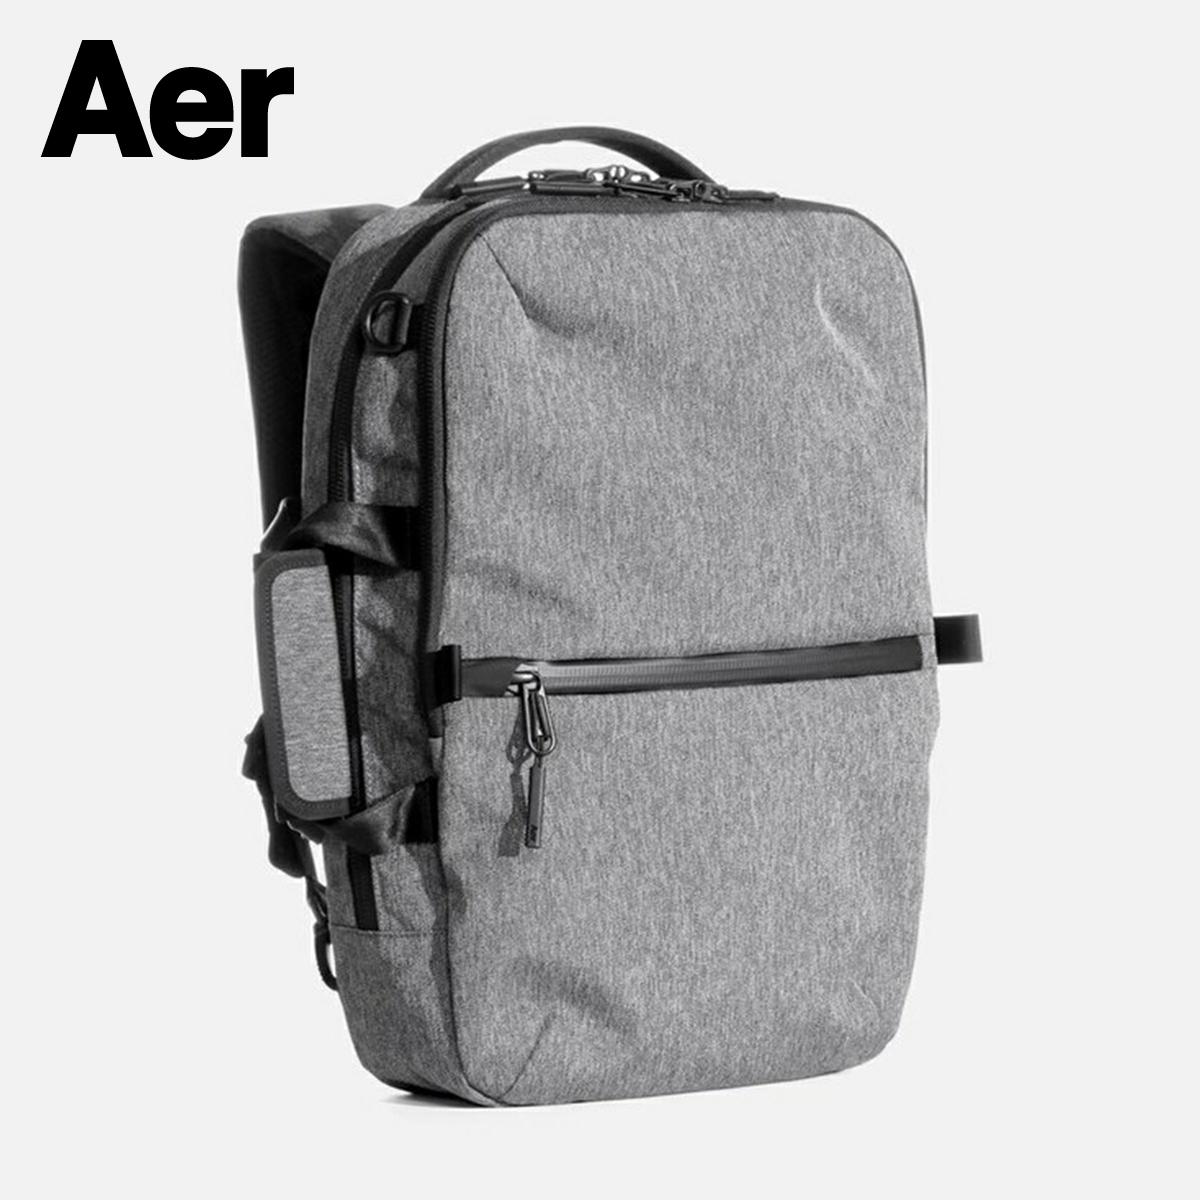 e386c98b1ec8 Air flight pack 2 rucksack backpack TRAVEL COLLECTION Flight Pack 2 Aer  22010